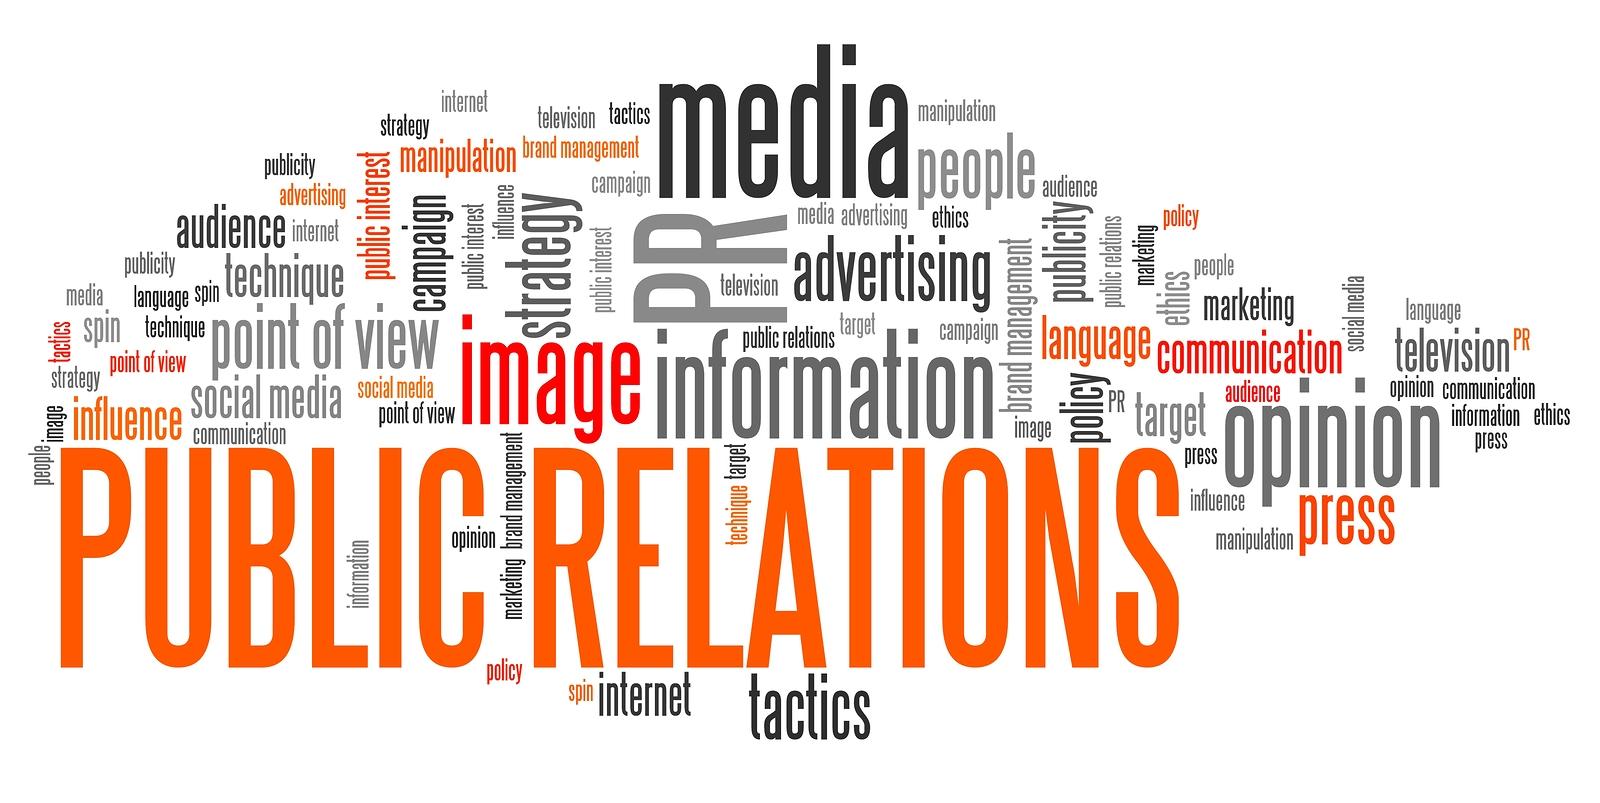 mmg M.E. Public Relations